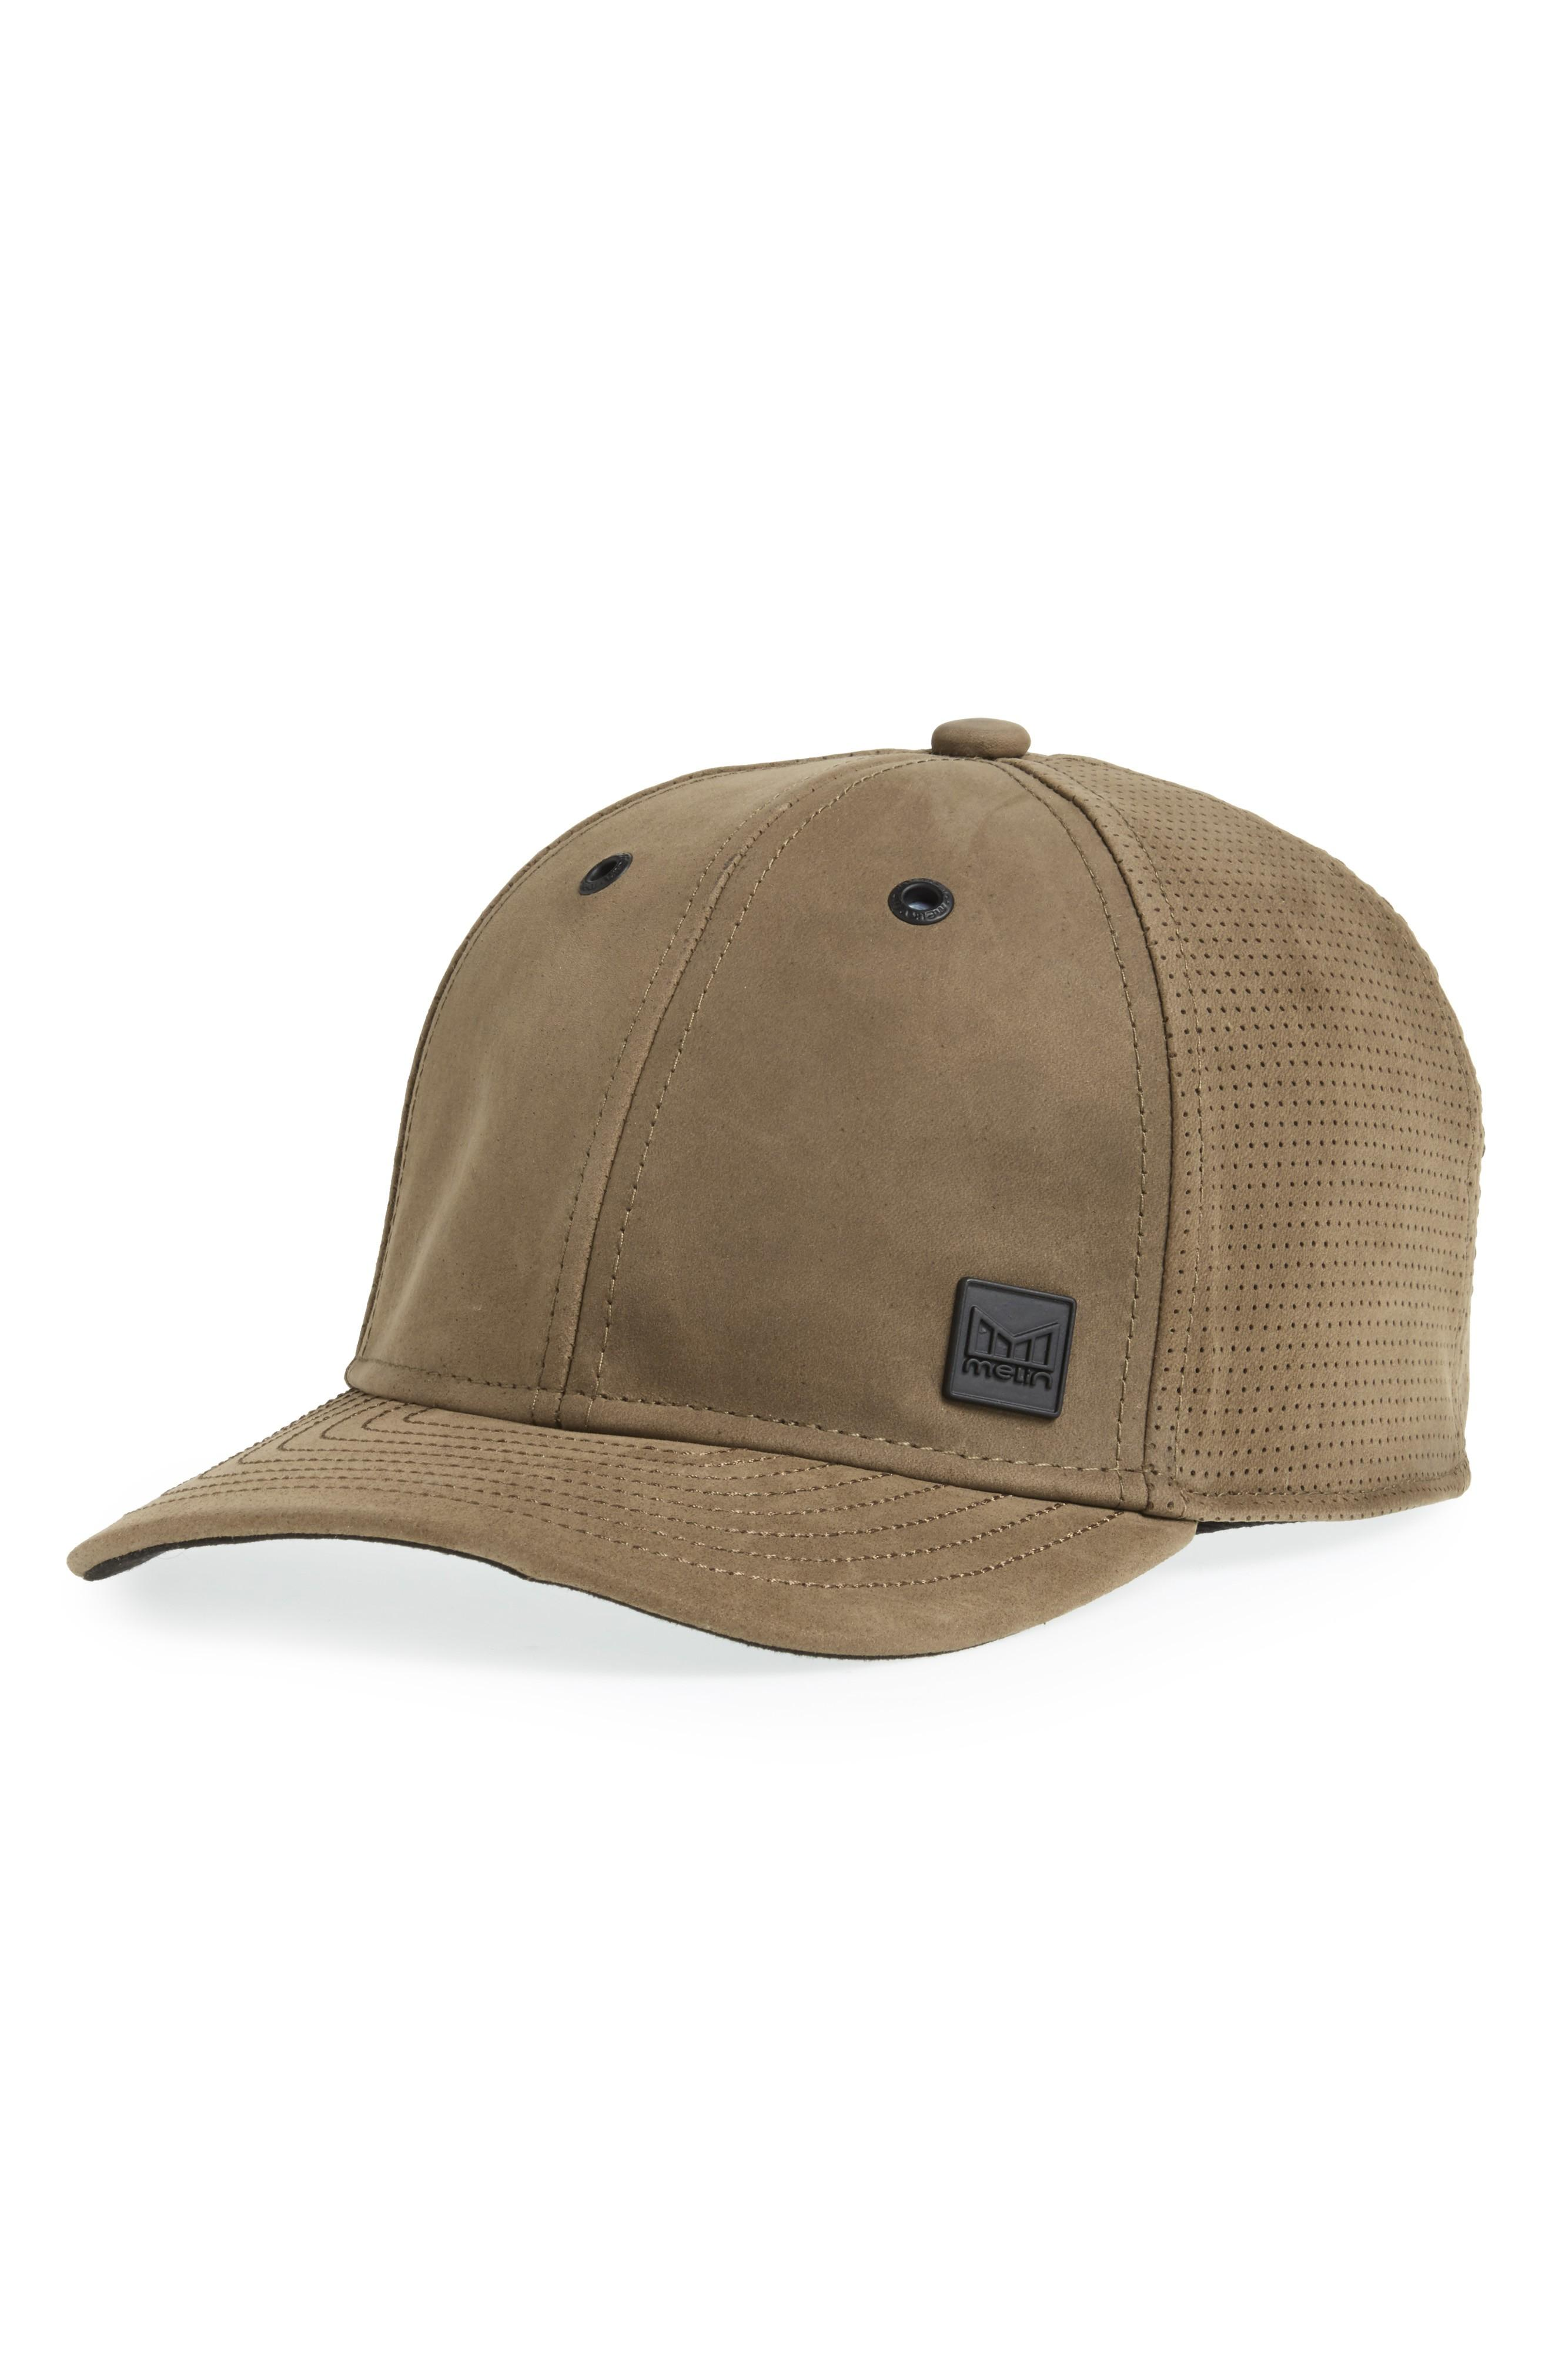 premium selection 5d150 d9ec2 Melin Voyage Elite Leather Ball Cap - Green In Moss